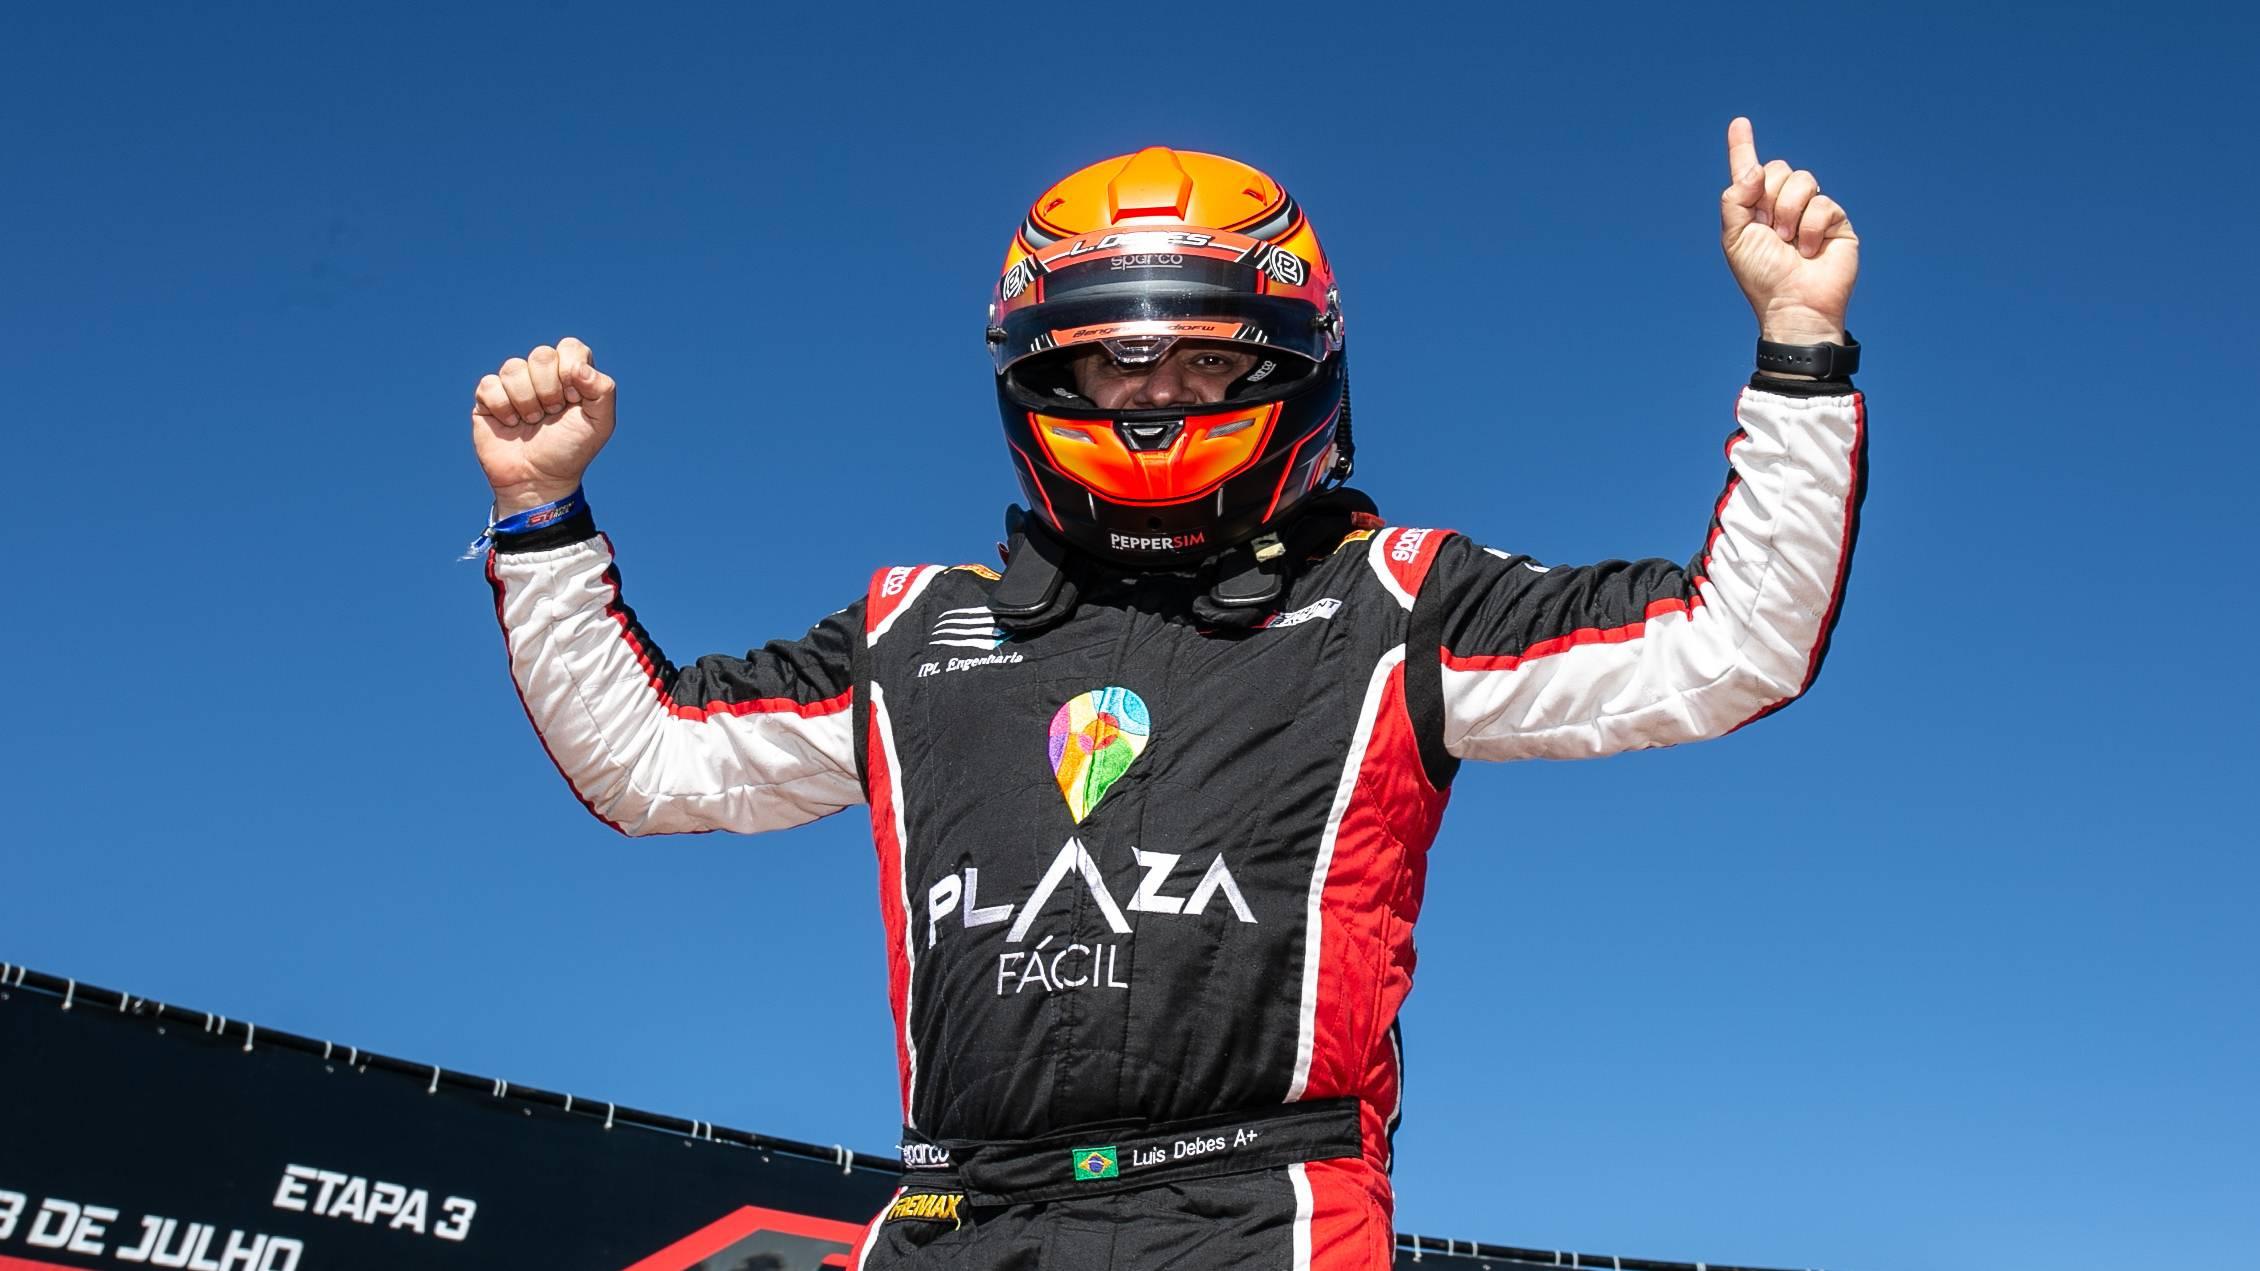 Luis Debes encosta na liderança da classe AM na GT Sprint Race 2021